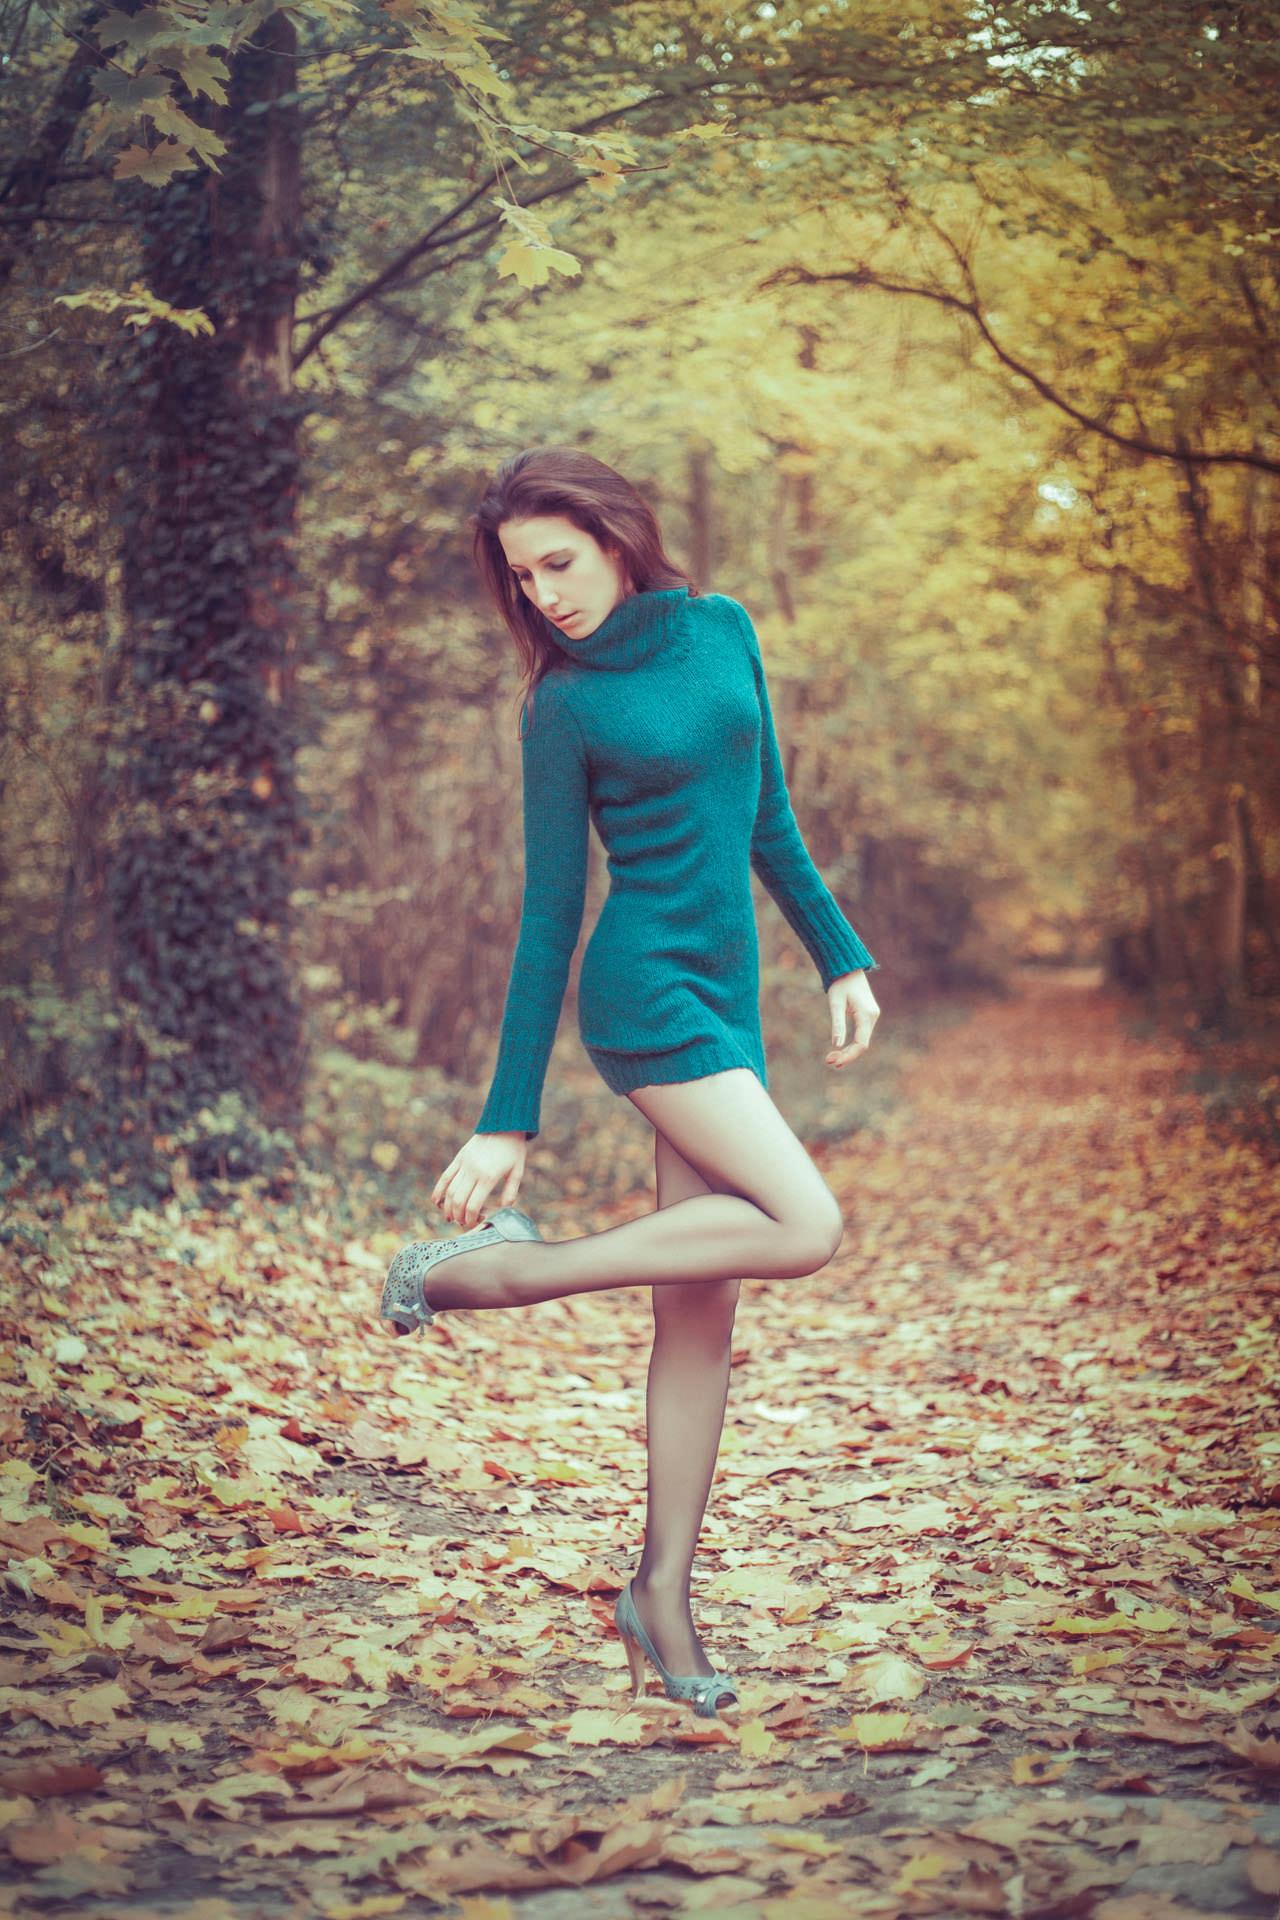 2012-11-15 - Delphine - Ballancourt - 0501 - 1920px